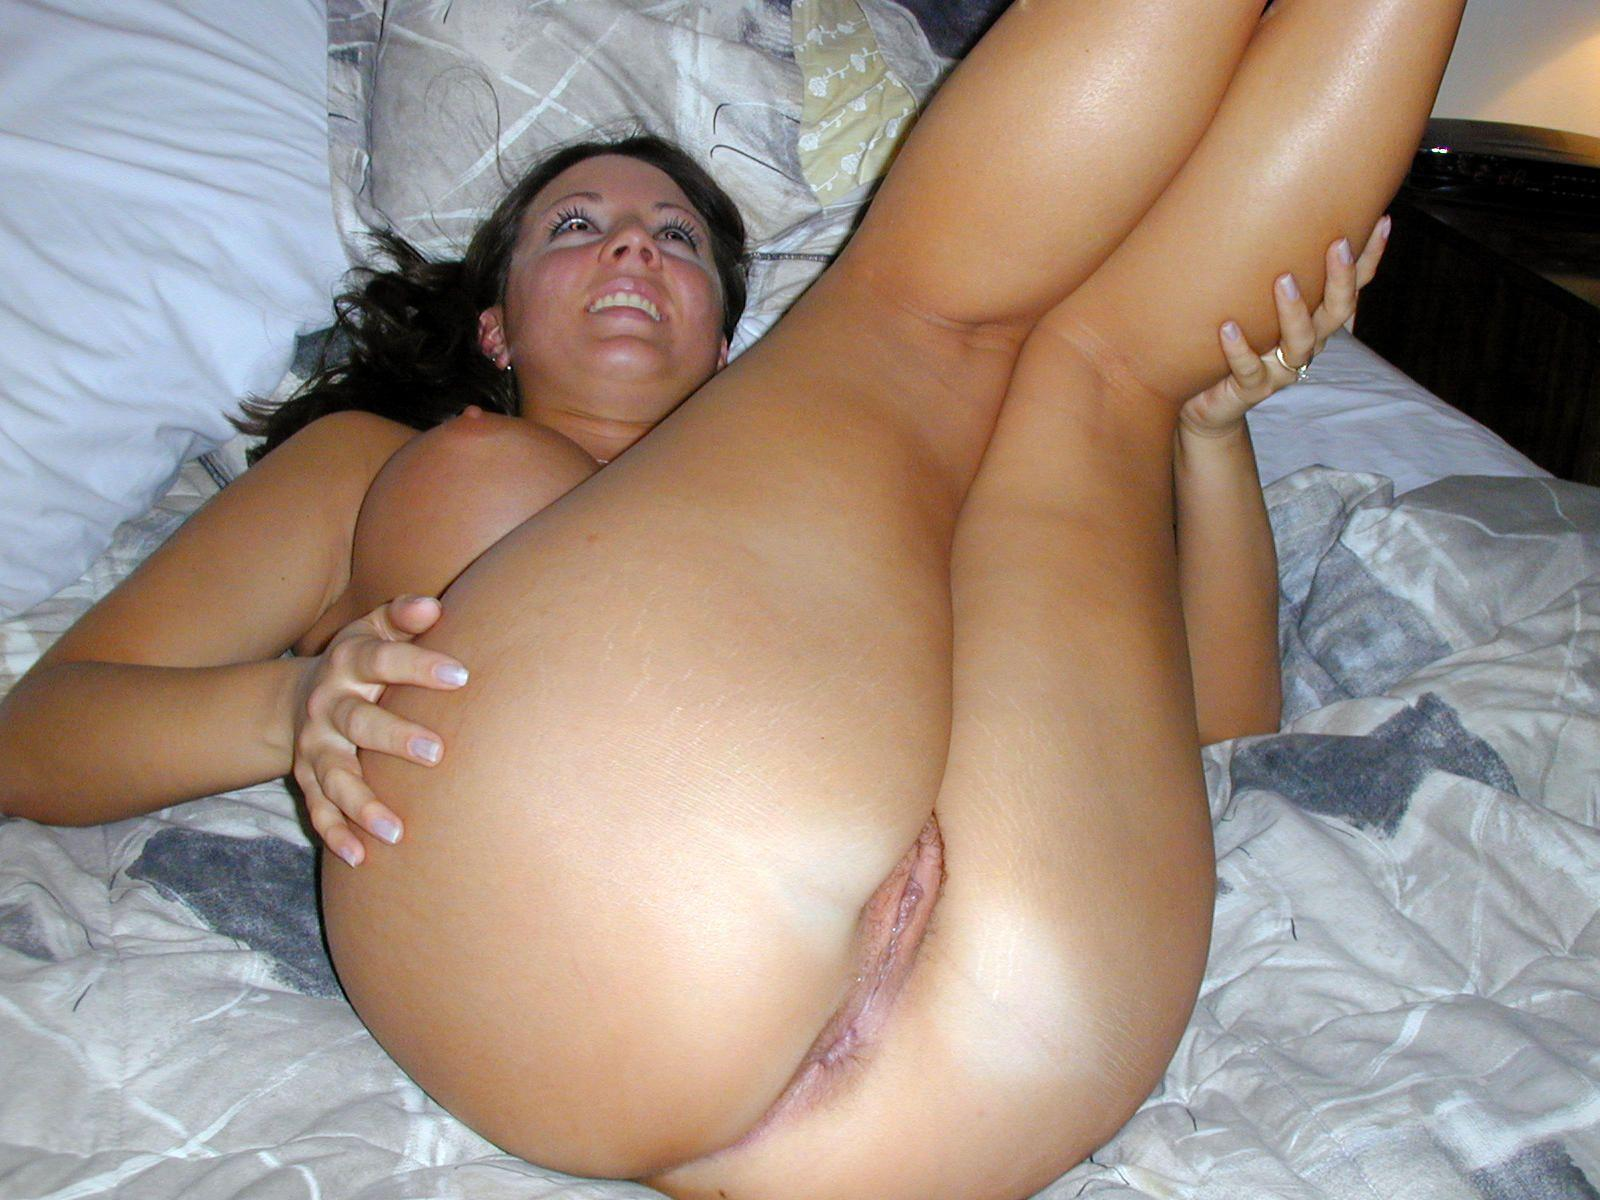 Порно фото с формами